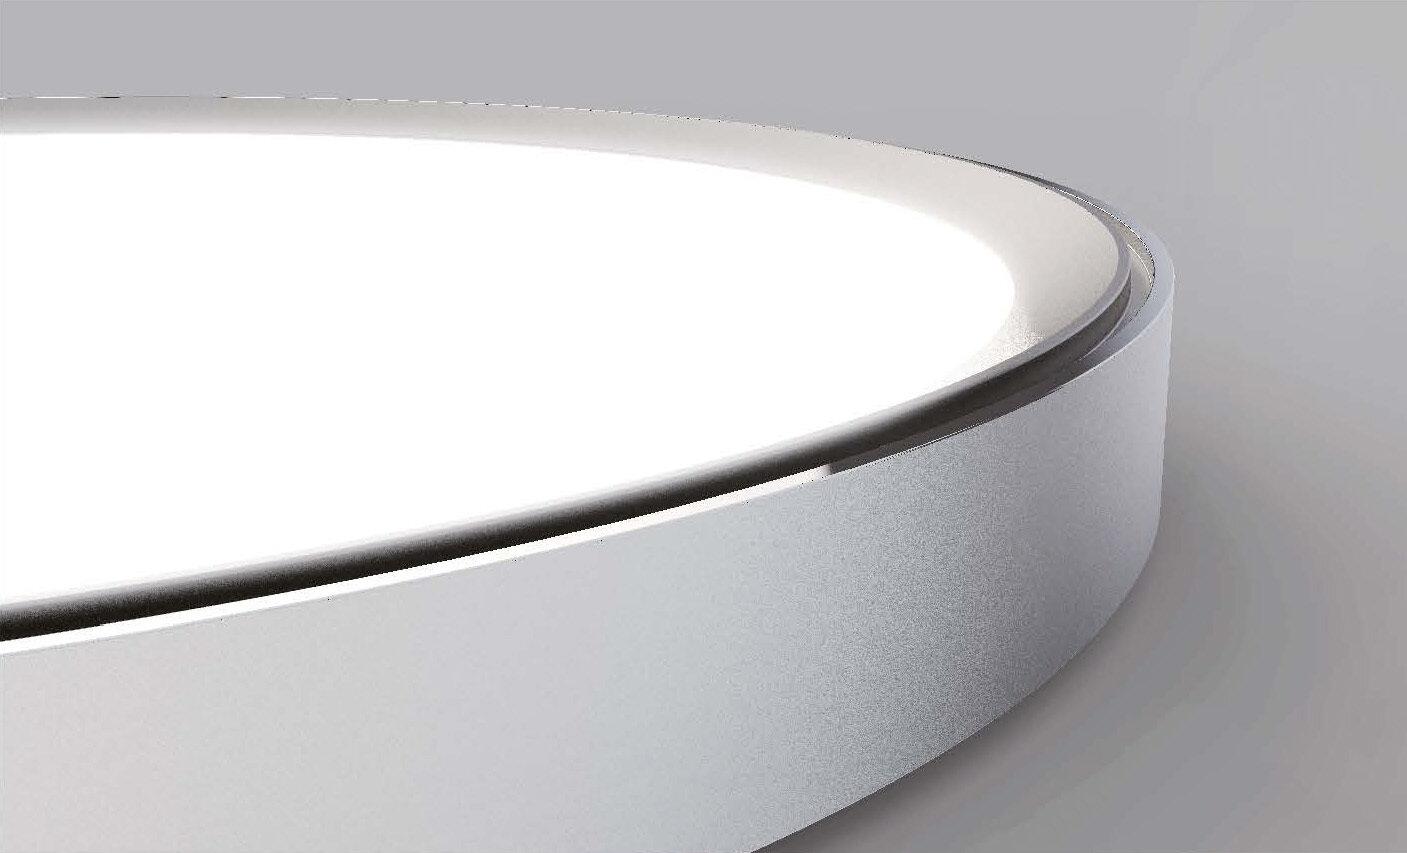 ProLuce® CODONE Aufbau-/Hängeleuchte 50W, weiss, Tri-Color, 4800 Lm, Ø550x44 mm, Backlight